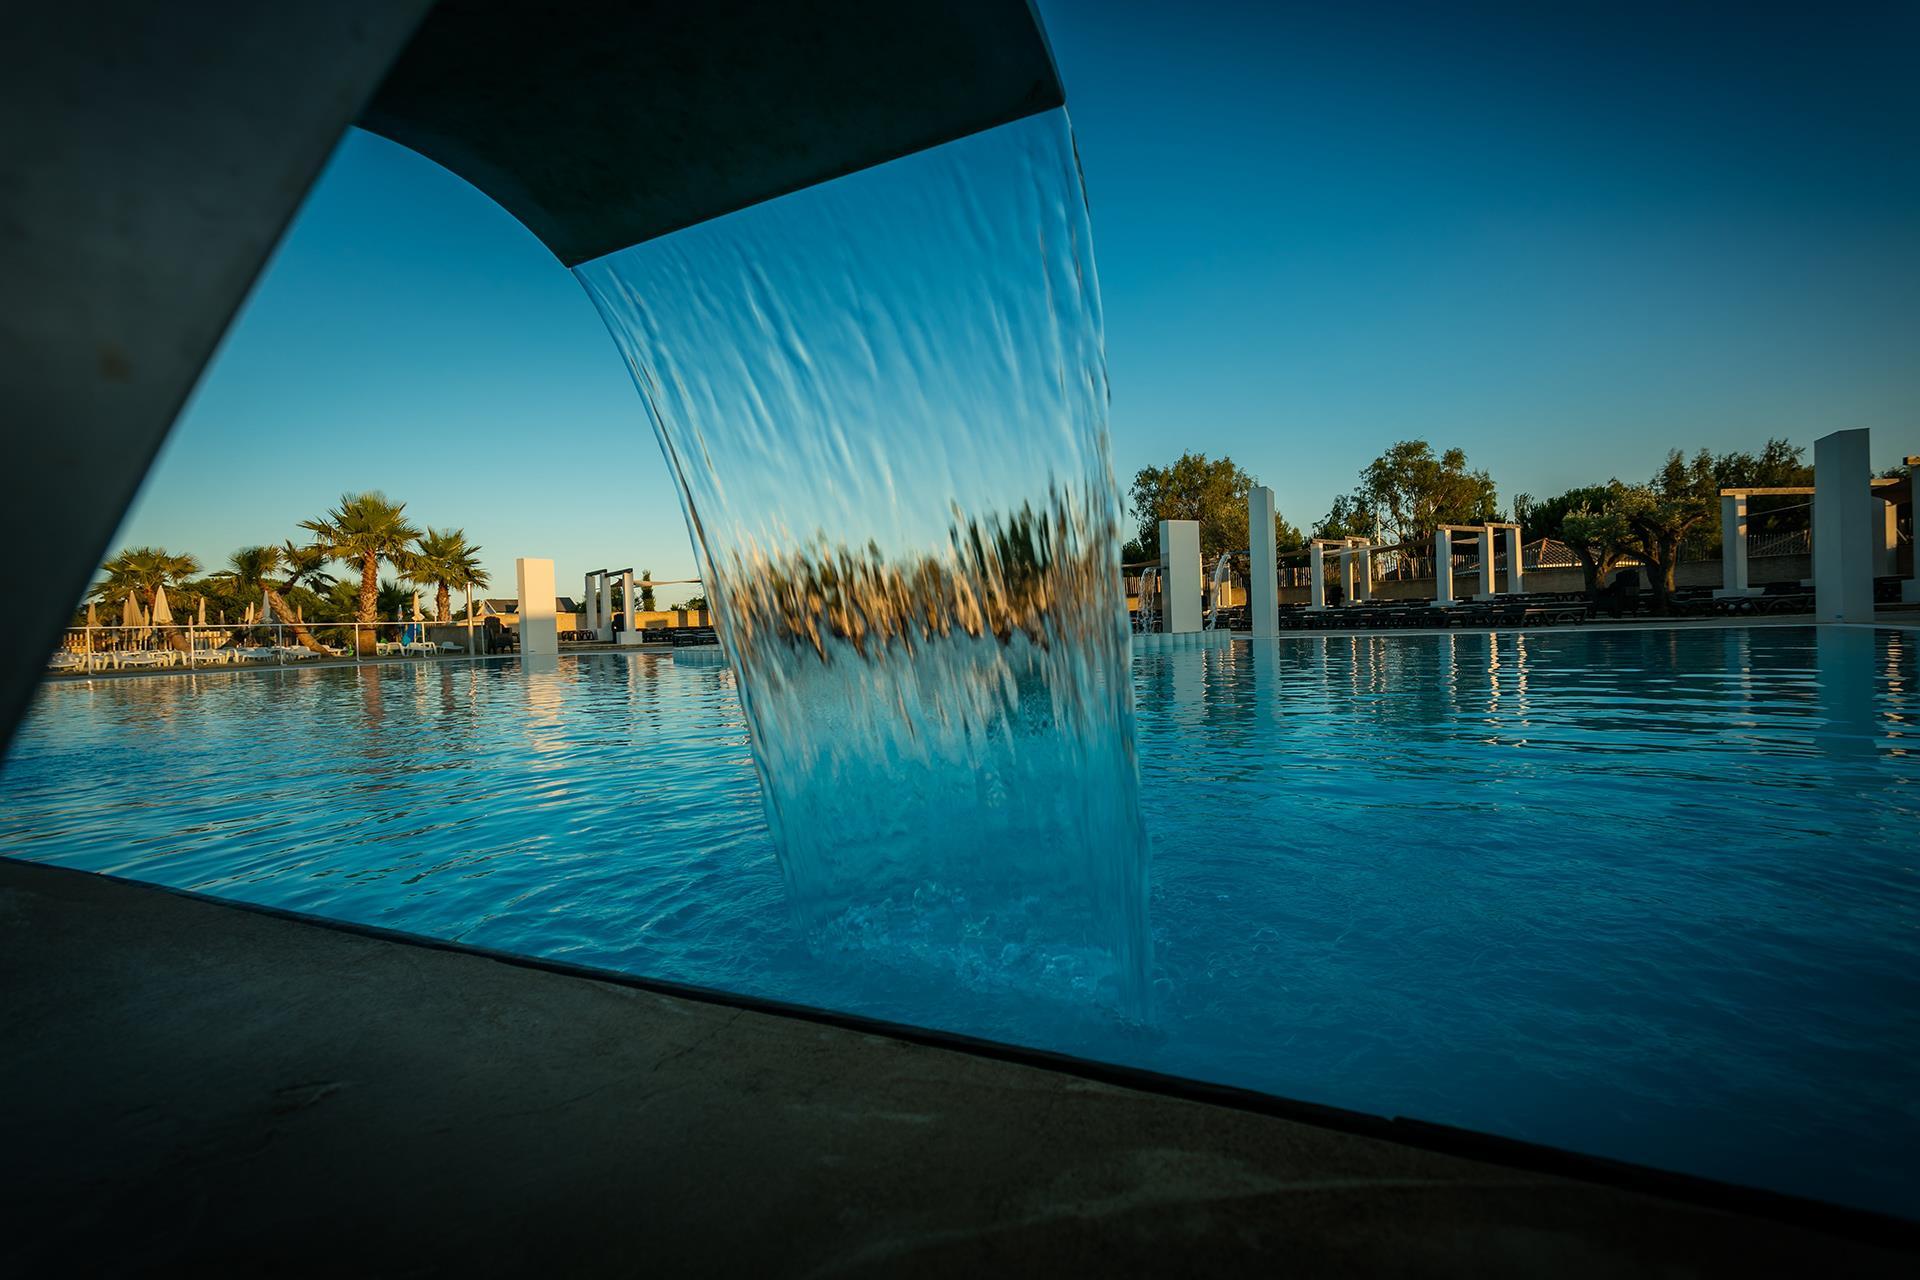 duzy basen wodospadowy palmy relaks